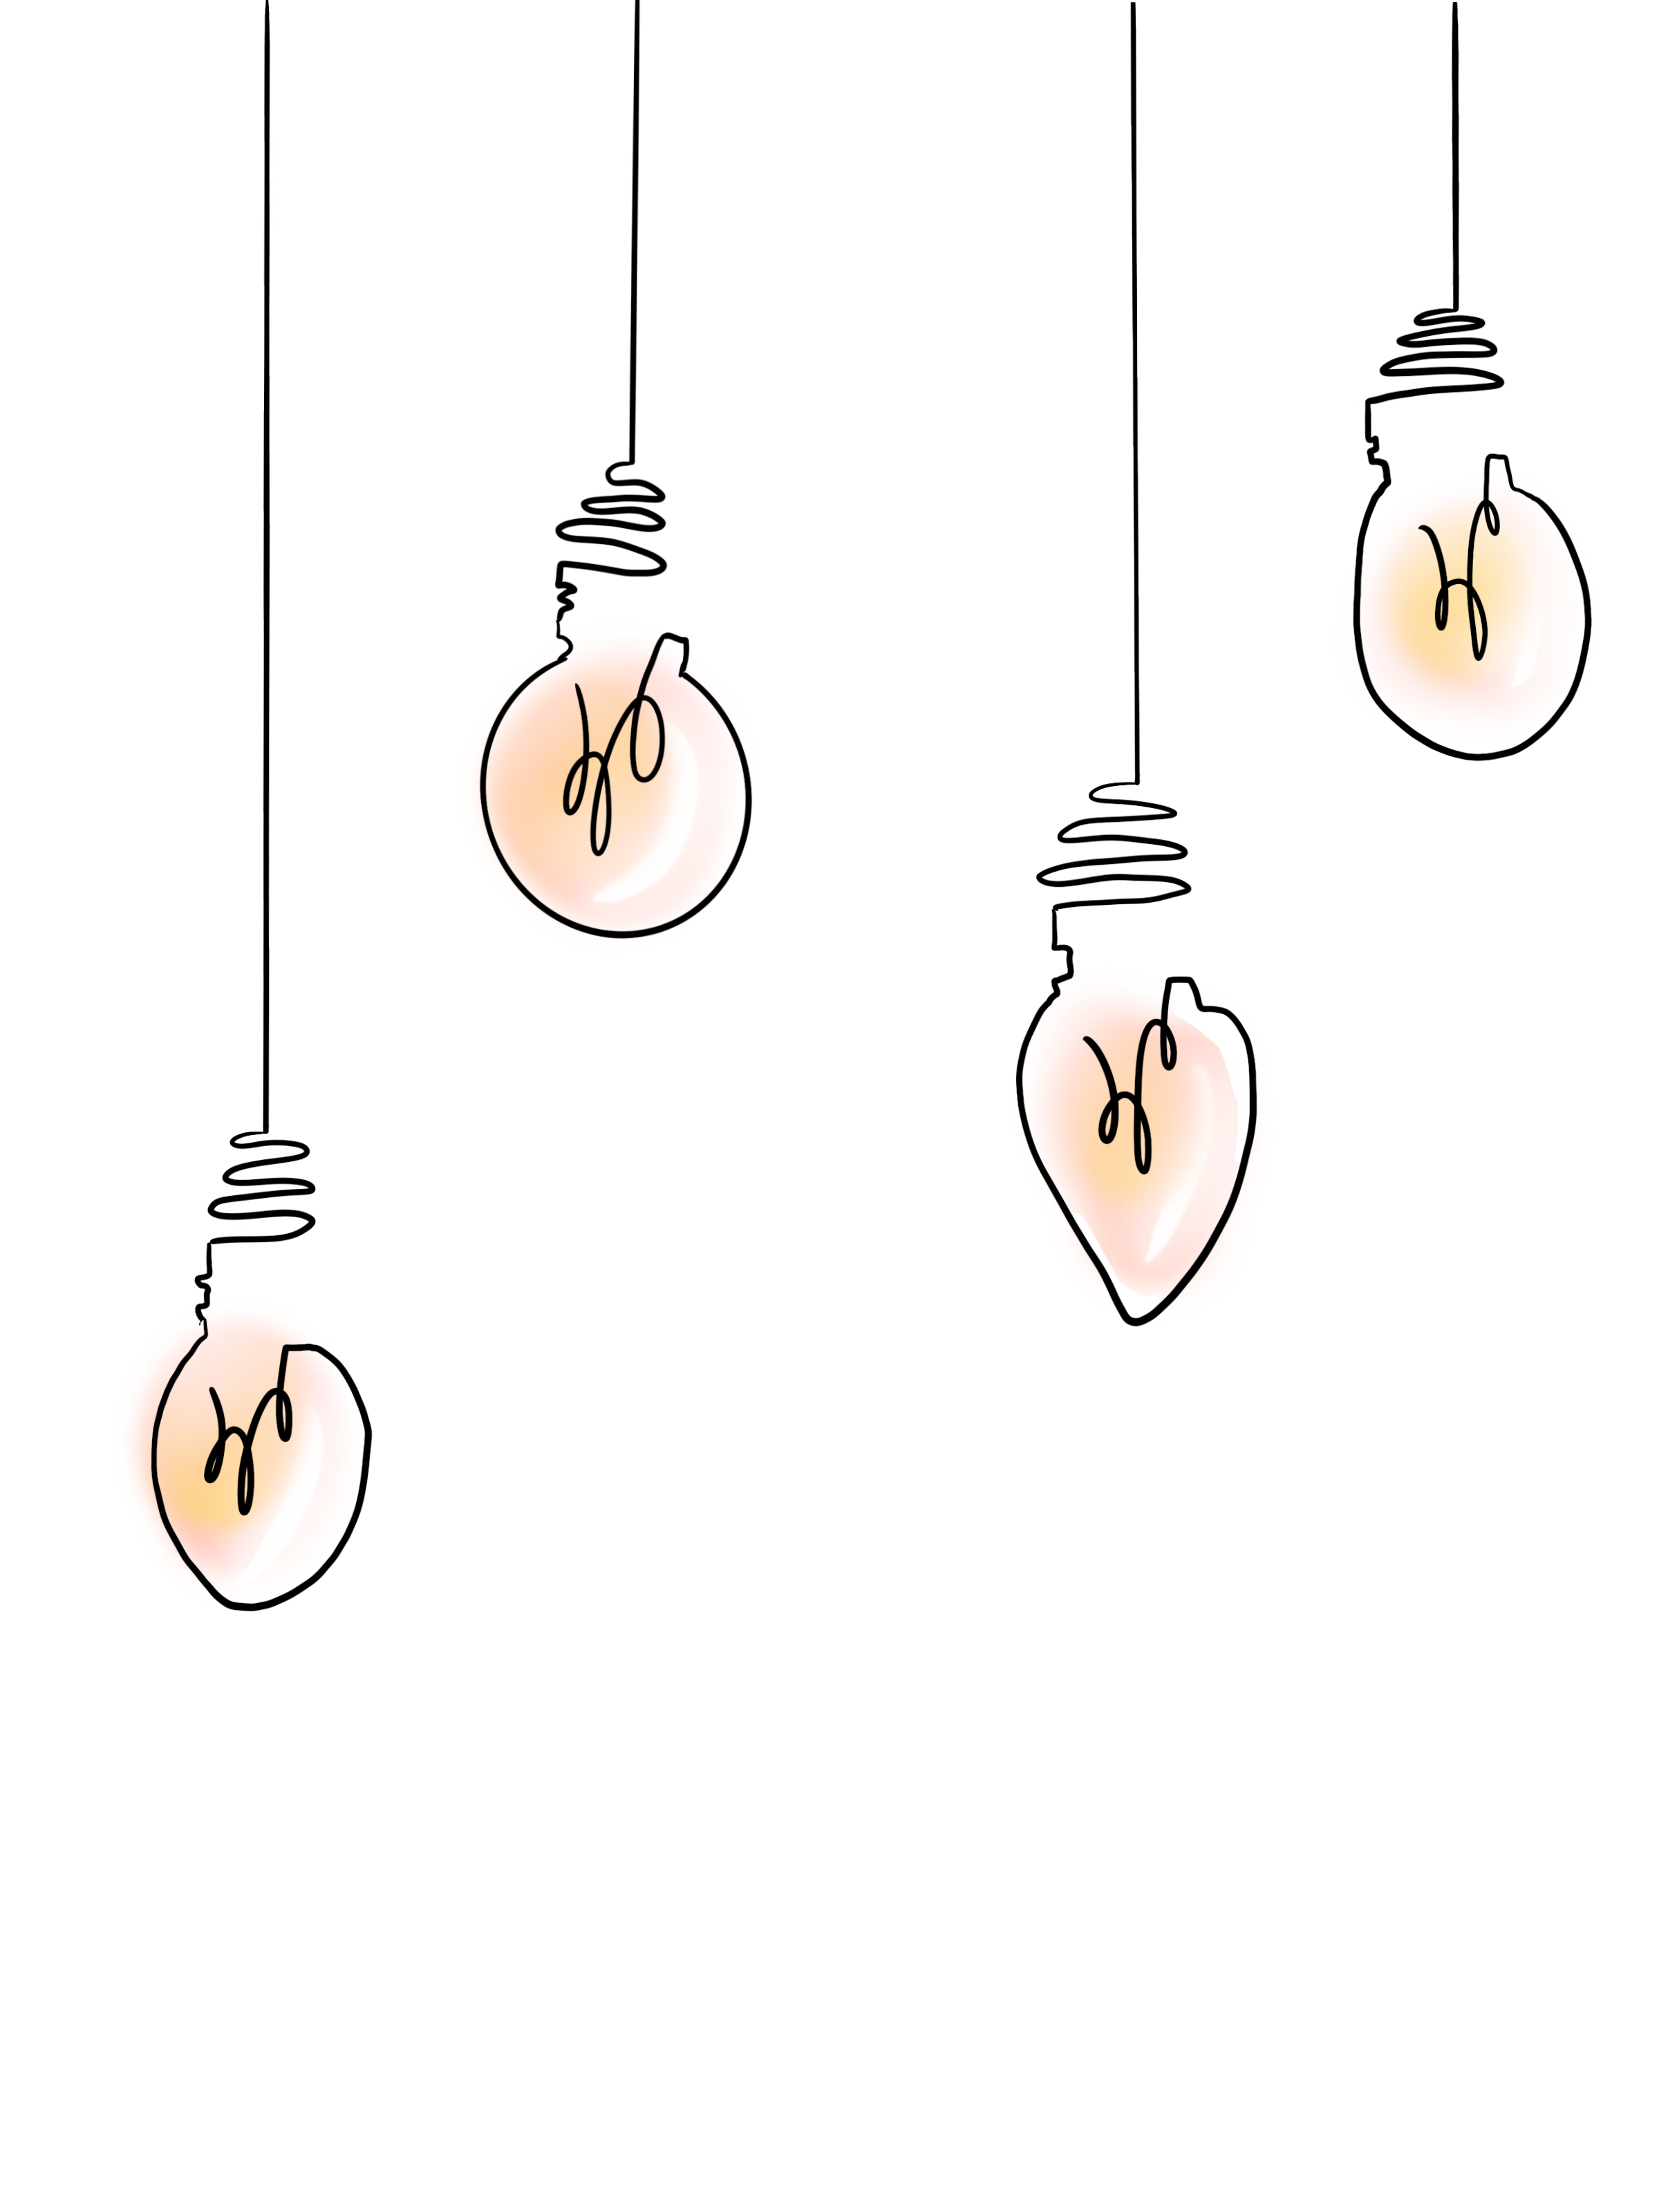 Simple Aesthetic stickers /lightbulb/